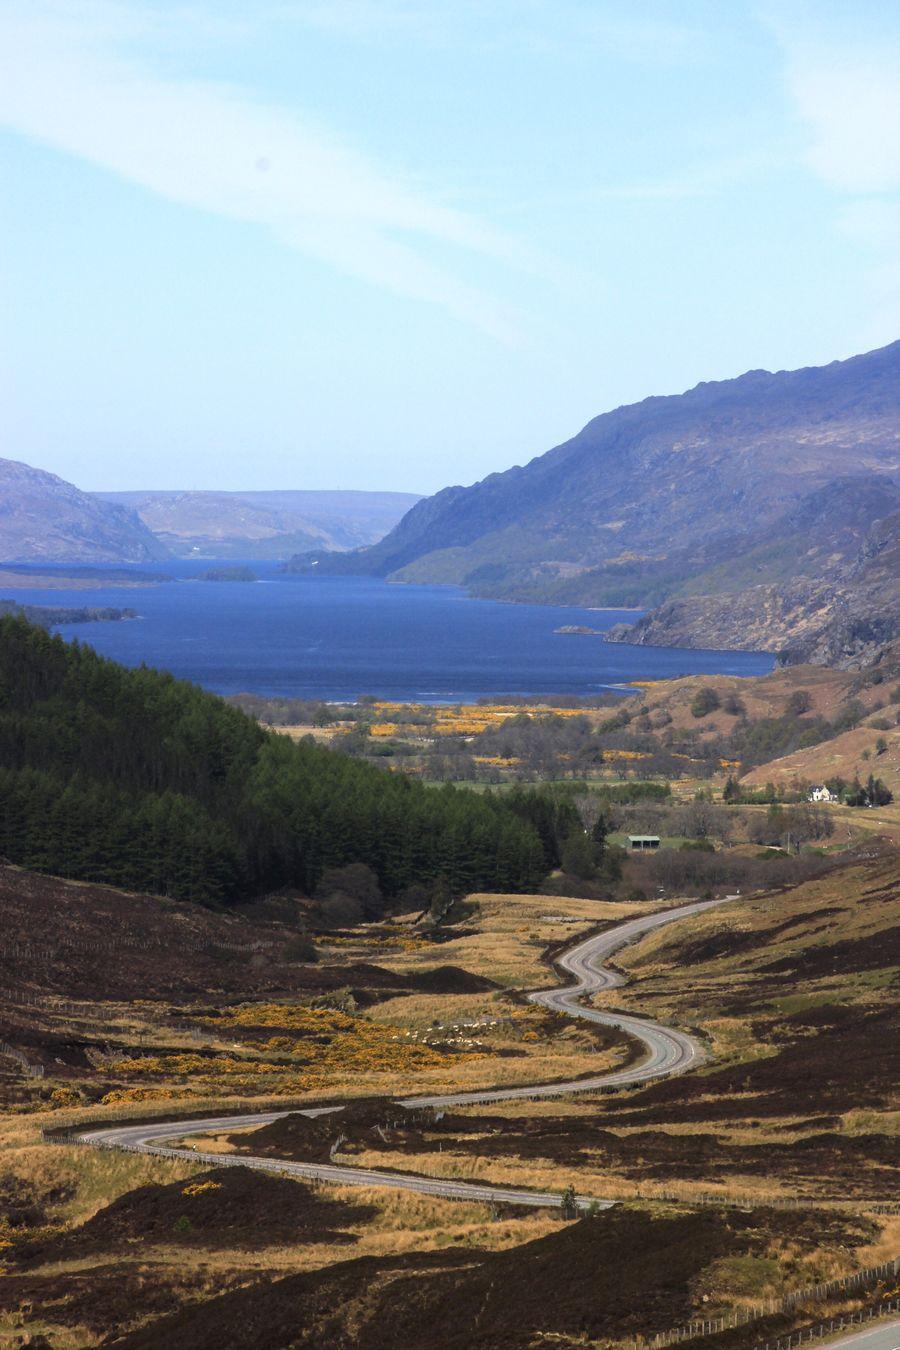 The wonderful winding road down to Loch Maree Mountain Landscape Winding Road Lochmaree Scottish Highlands Sunny Day EyeEm Best Shots Travelscotland Travel